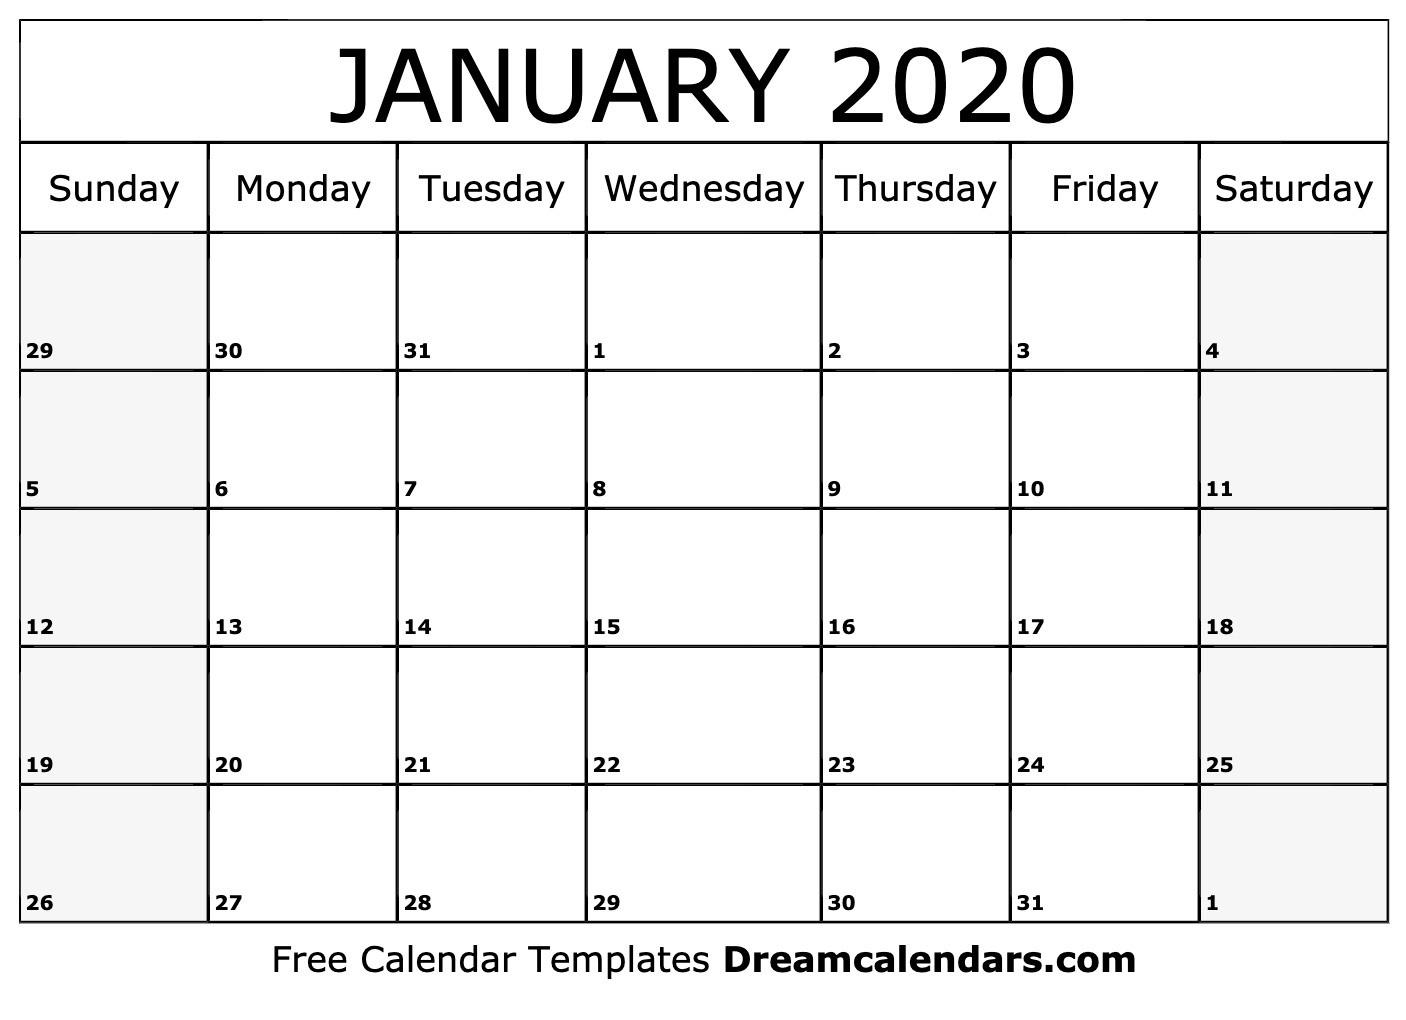 Printable January 2020 Calendar-Lunar Calendar January 2020